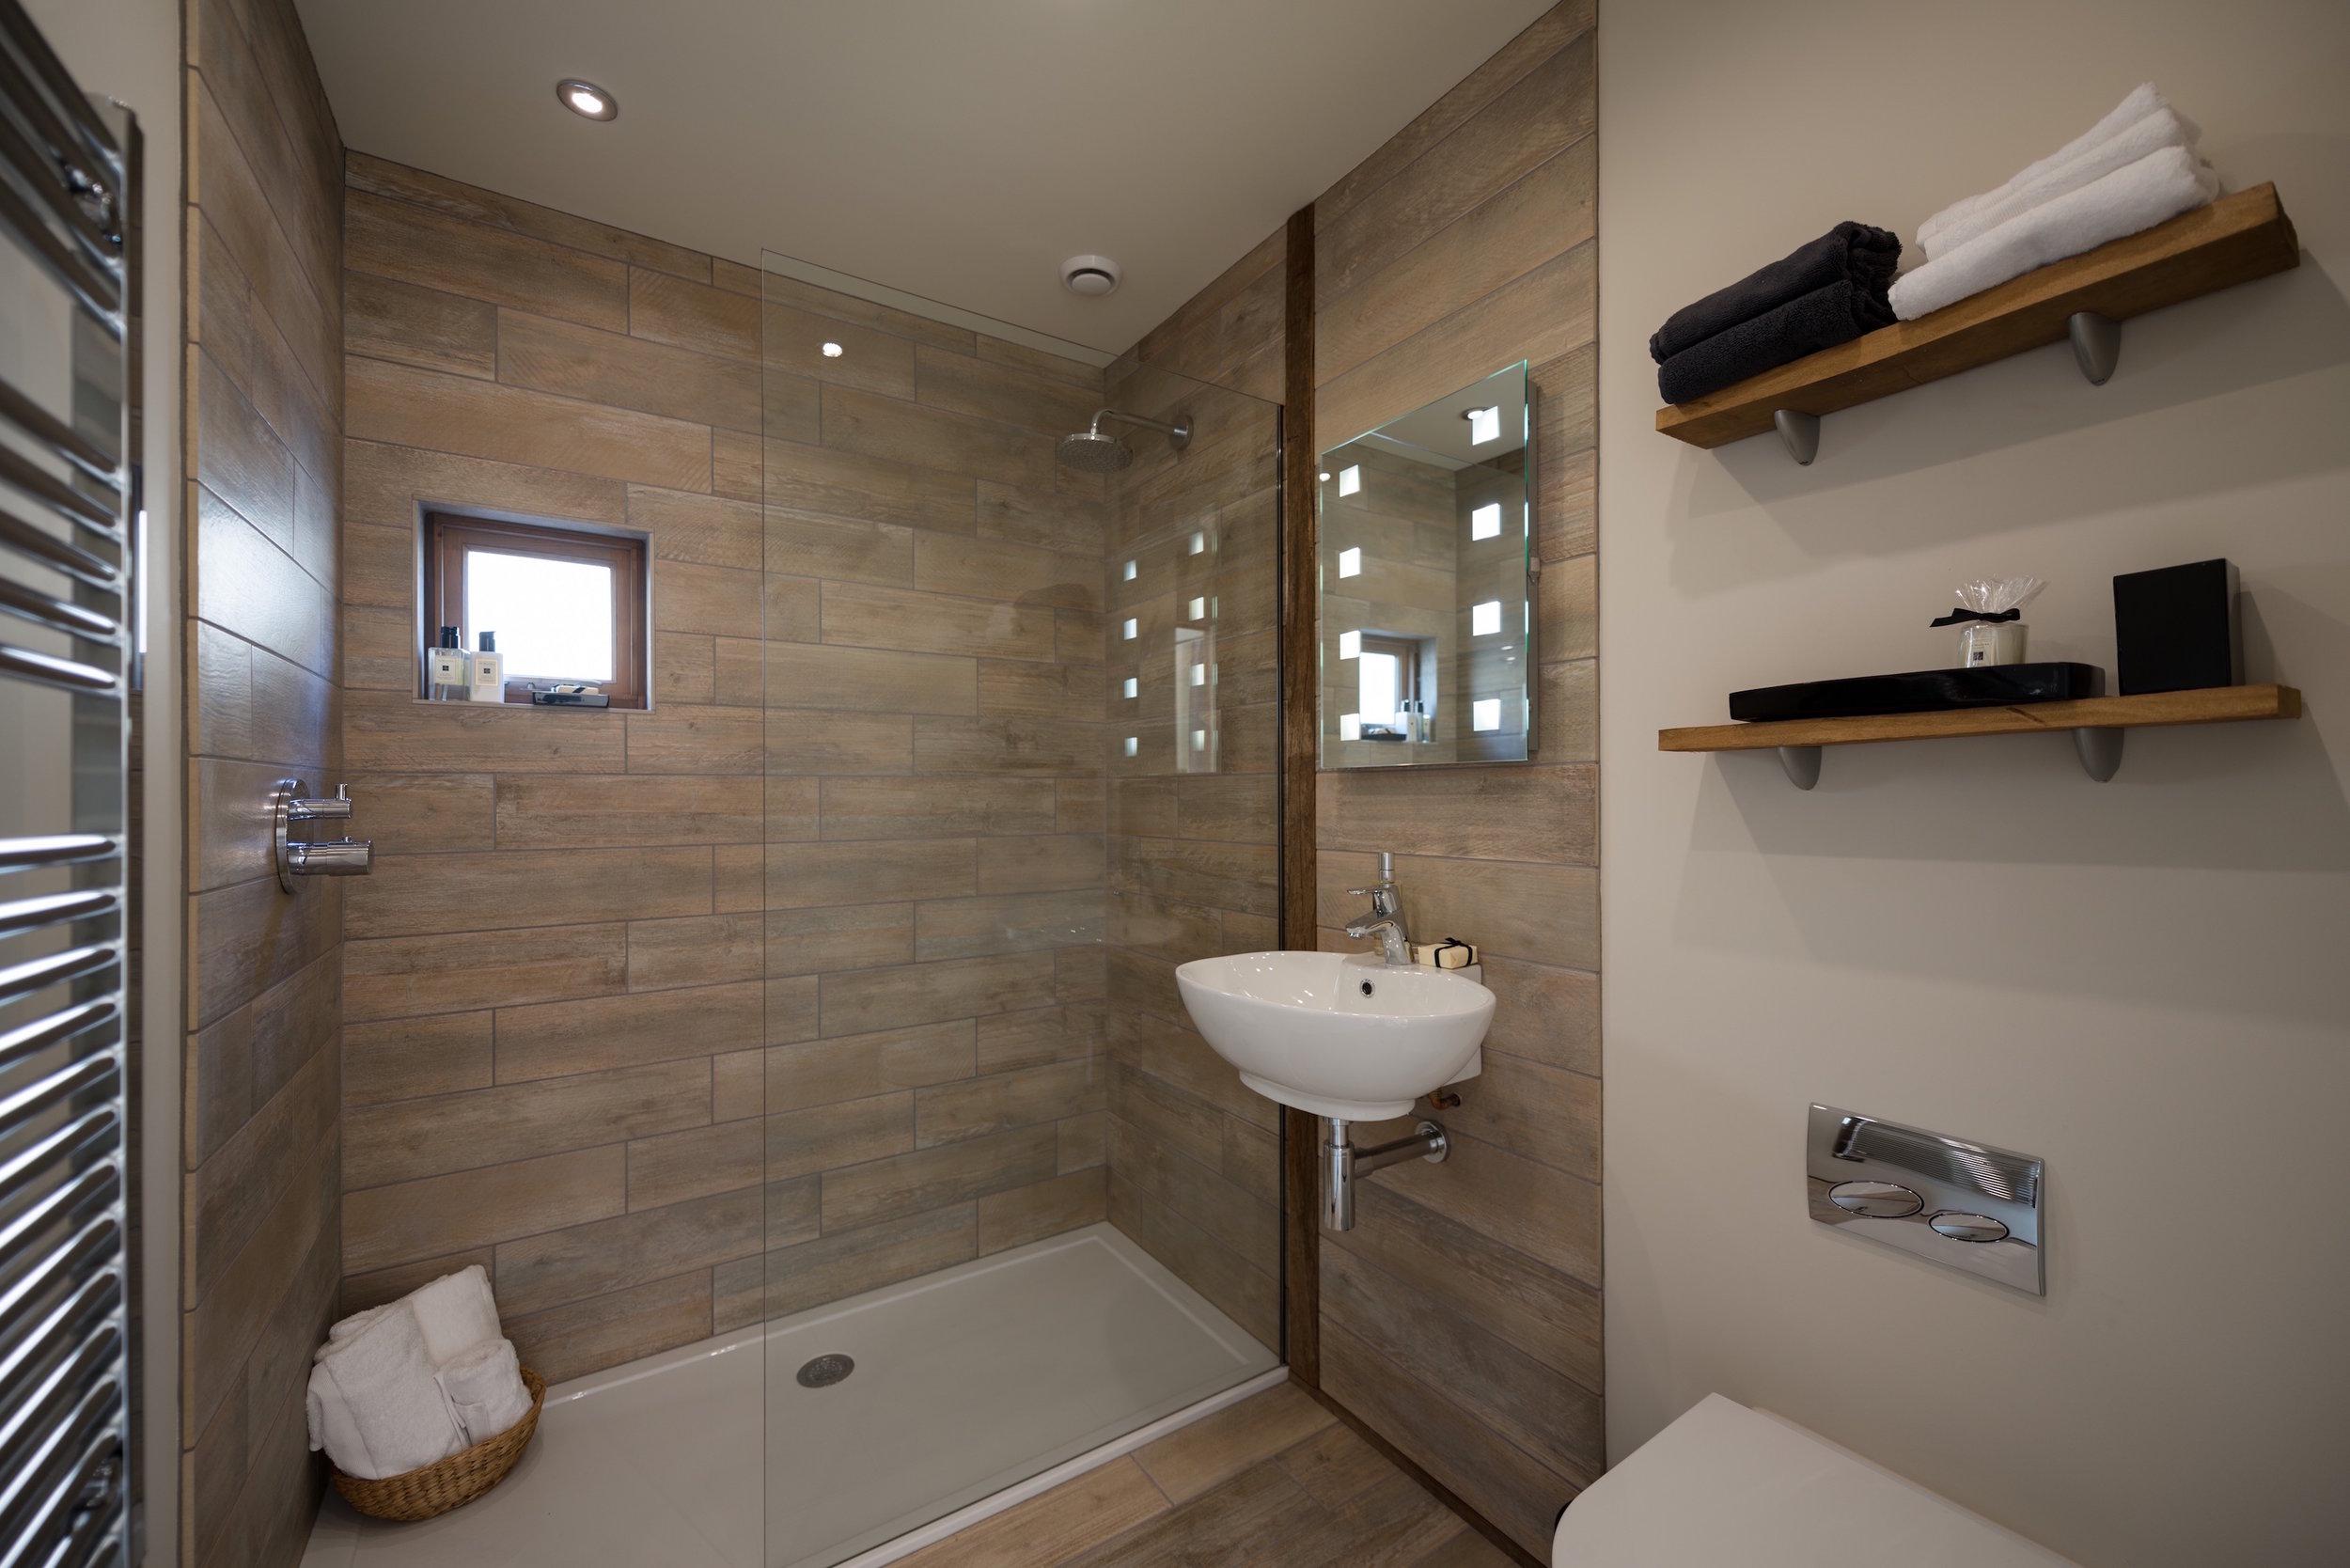 Eco Floating Home bathroom